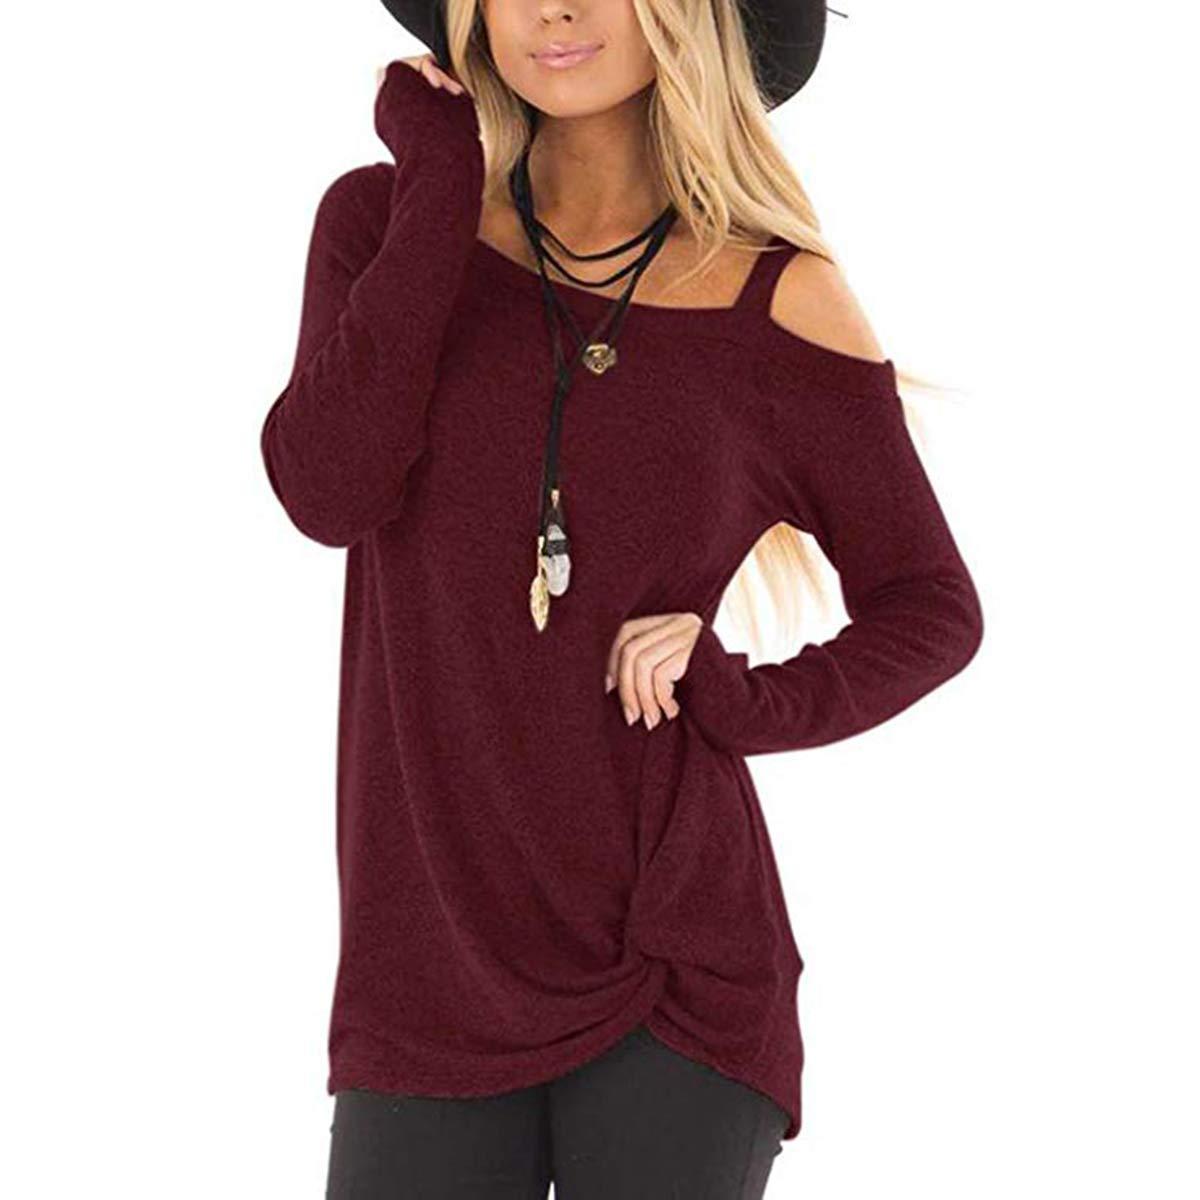 Coldshoulder Burgundy Ilfioreemio Women Knit Tunic Top Round Neck Blouse Knot Twist Front Long Sleeve Casual Soft Sweatshirt